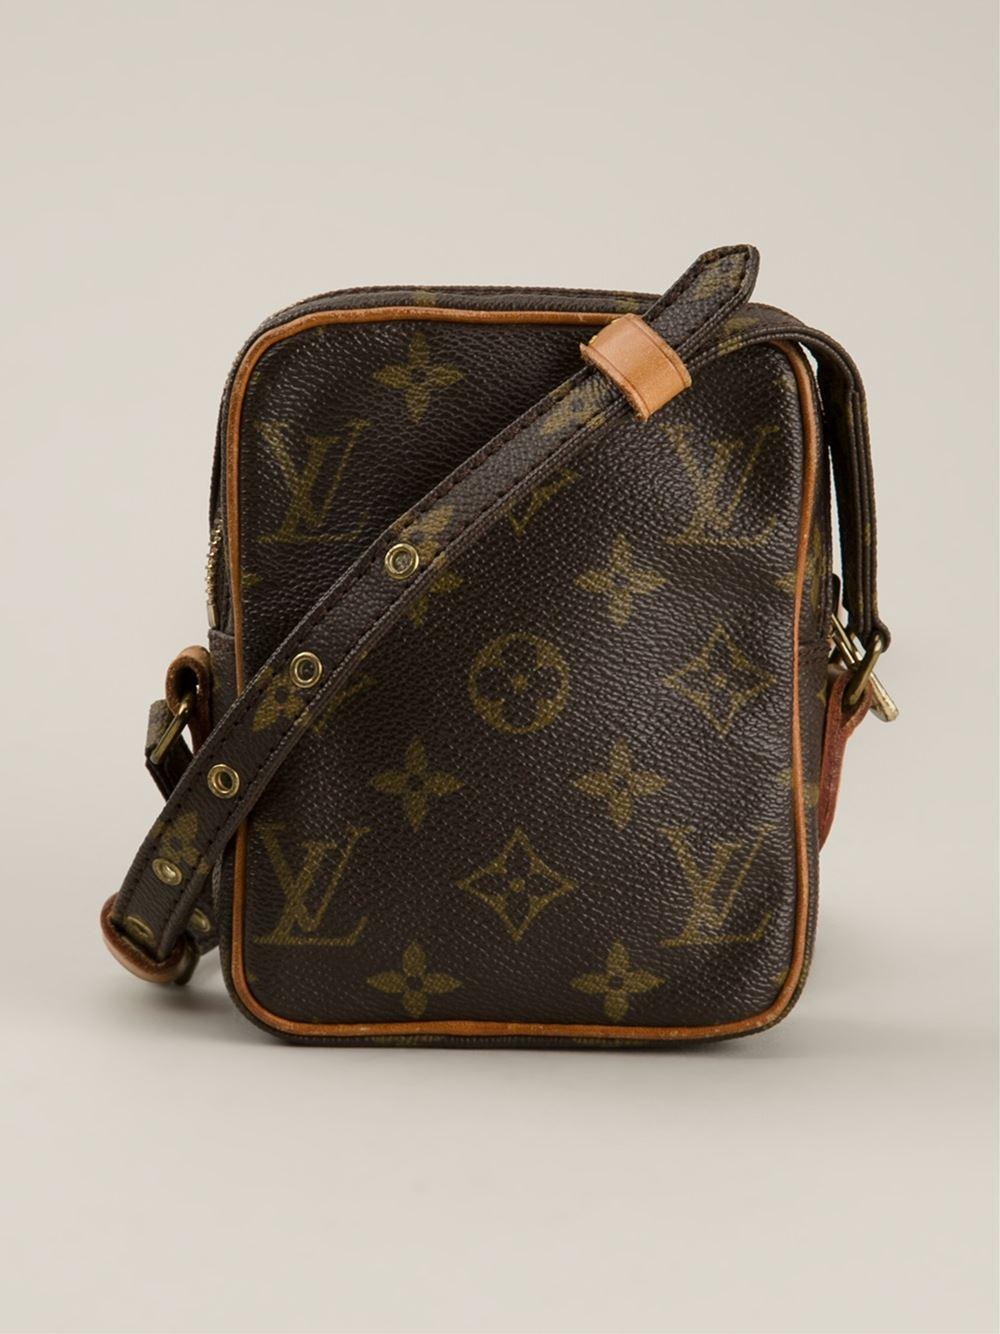 263bd8463267 Lyst - Louis Vuitton Mini  Danube  Shoulder Bag in Brown